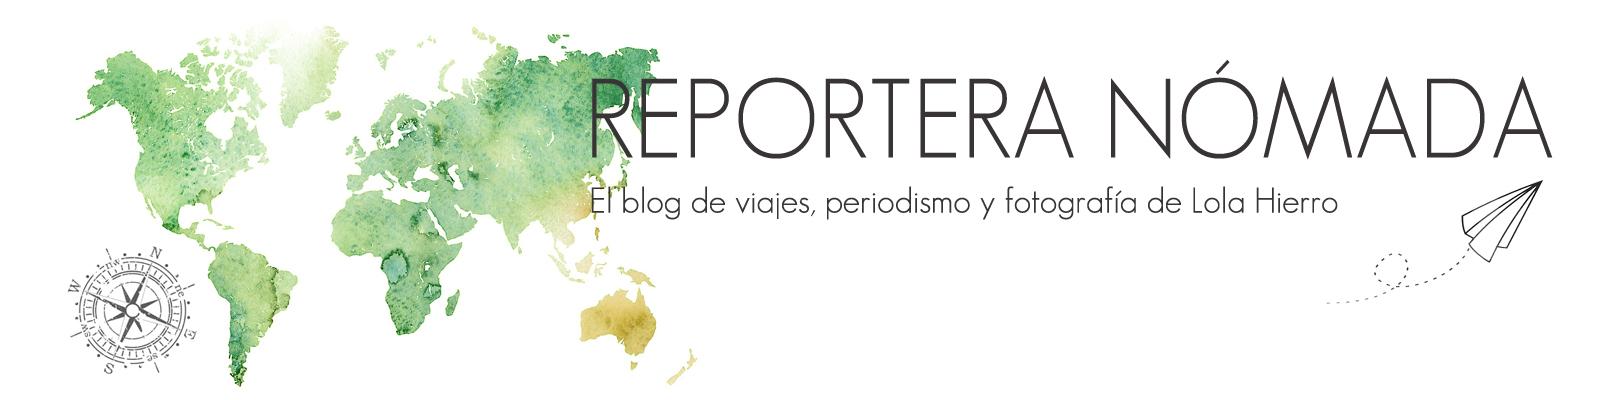 reporteranomada cabecera2